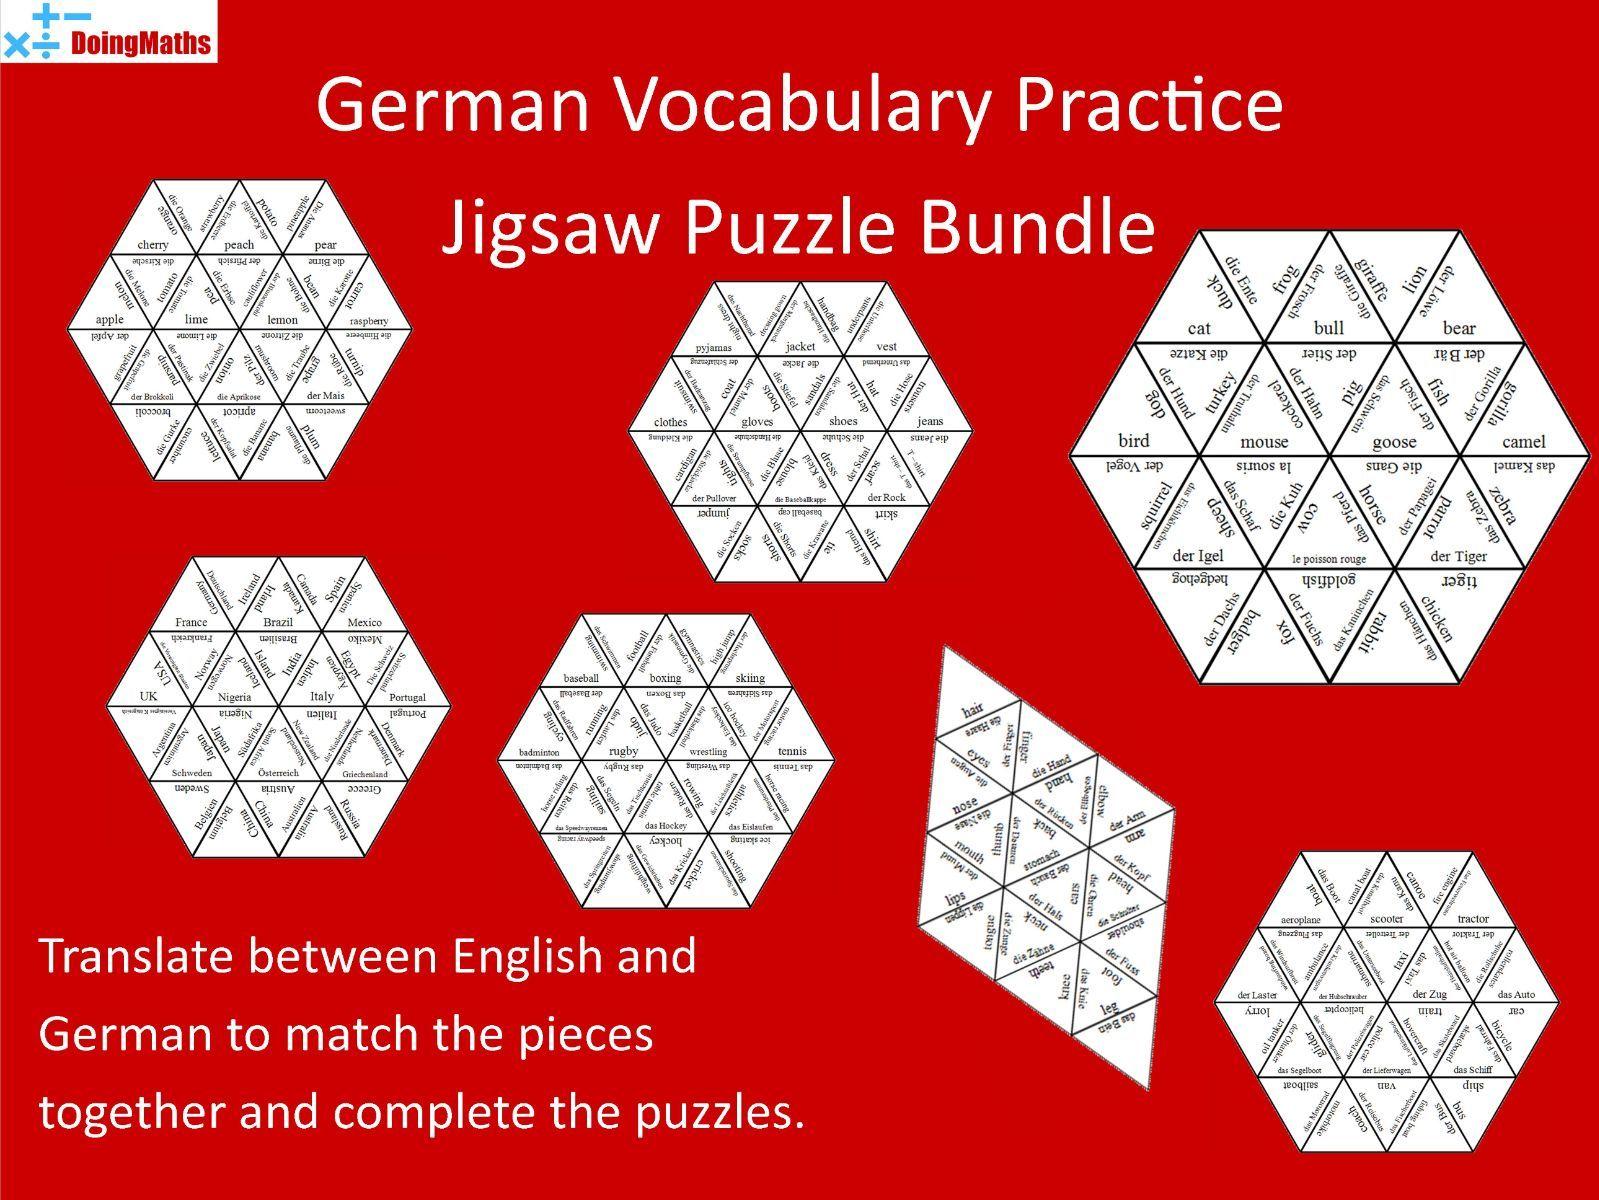 German Vocabulary Practice - Jigsaw Puzzles